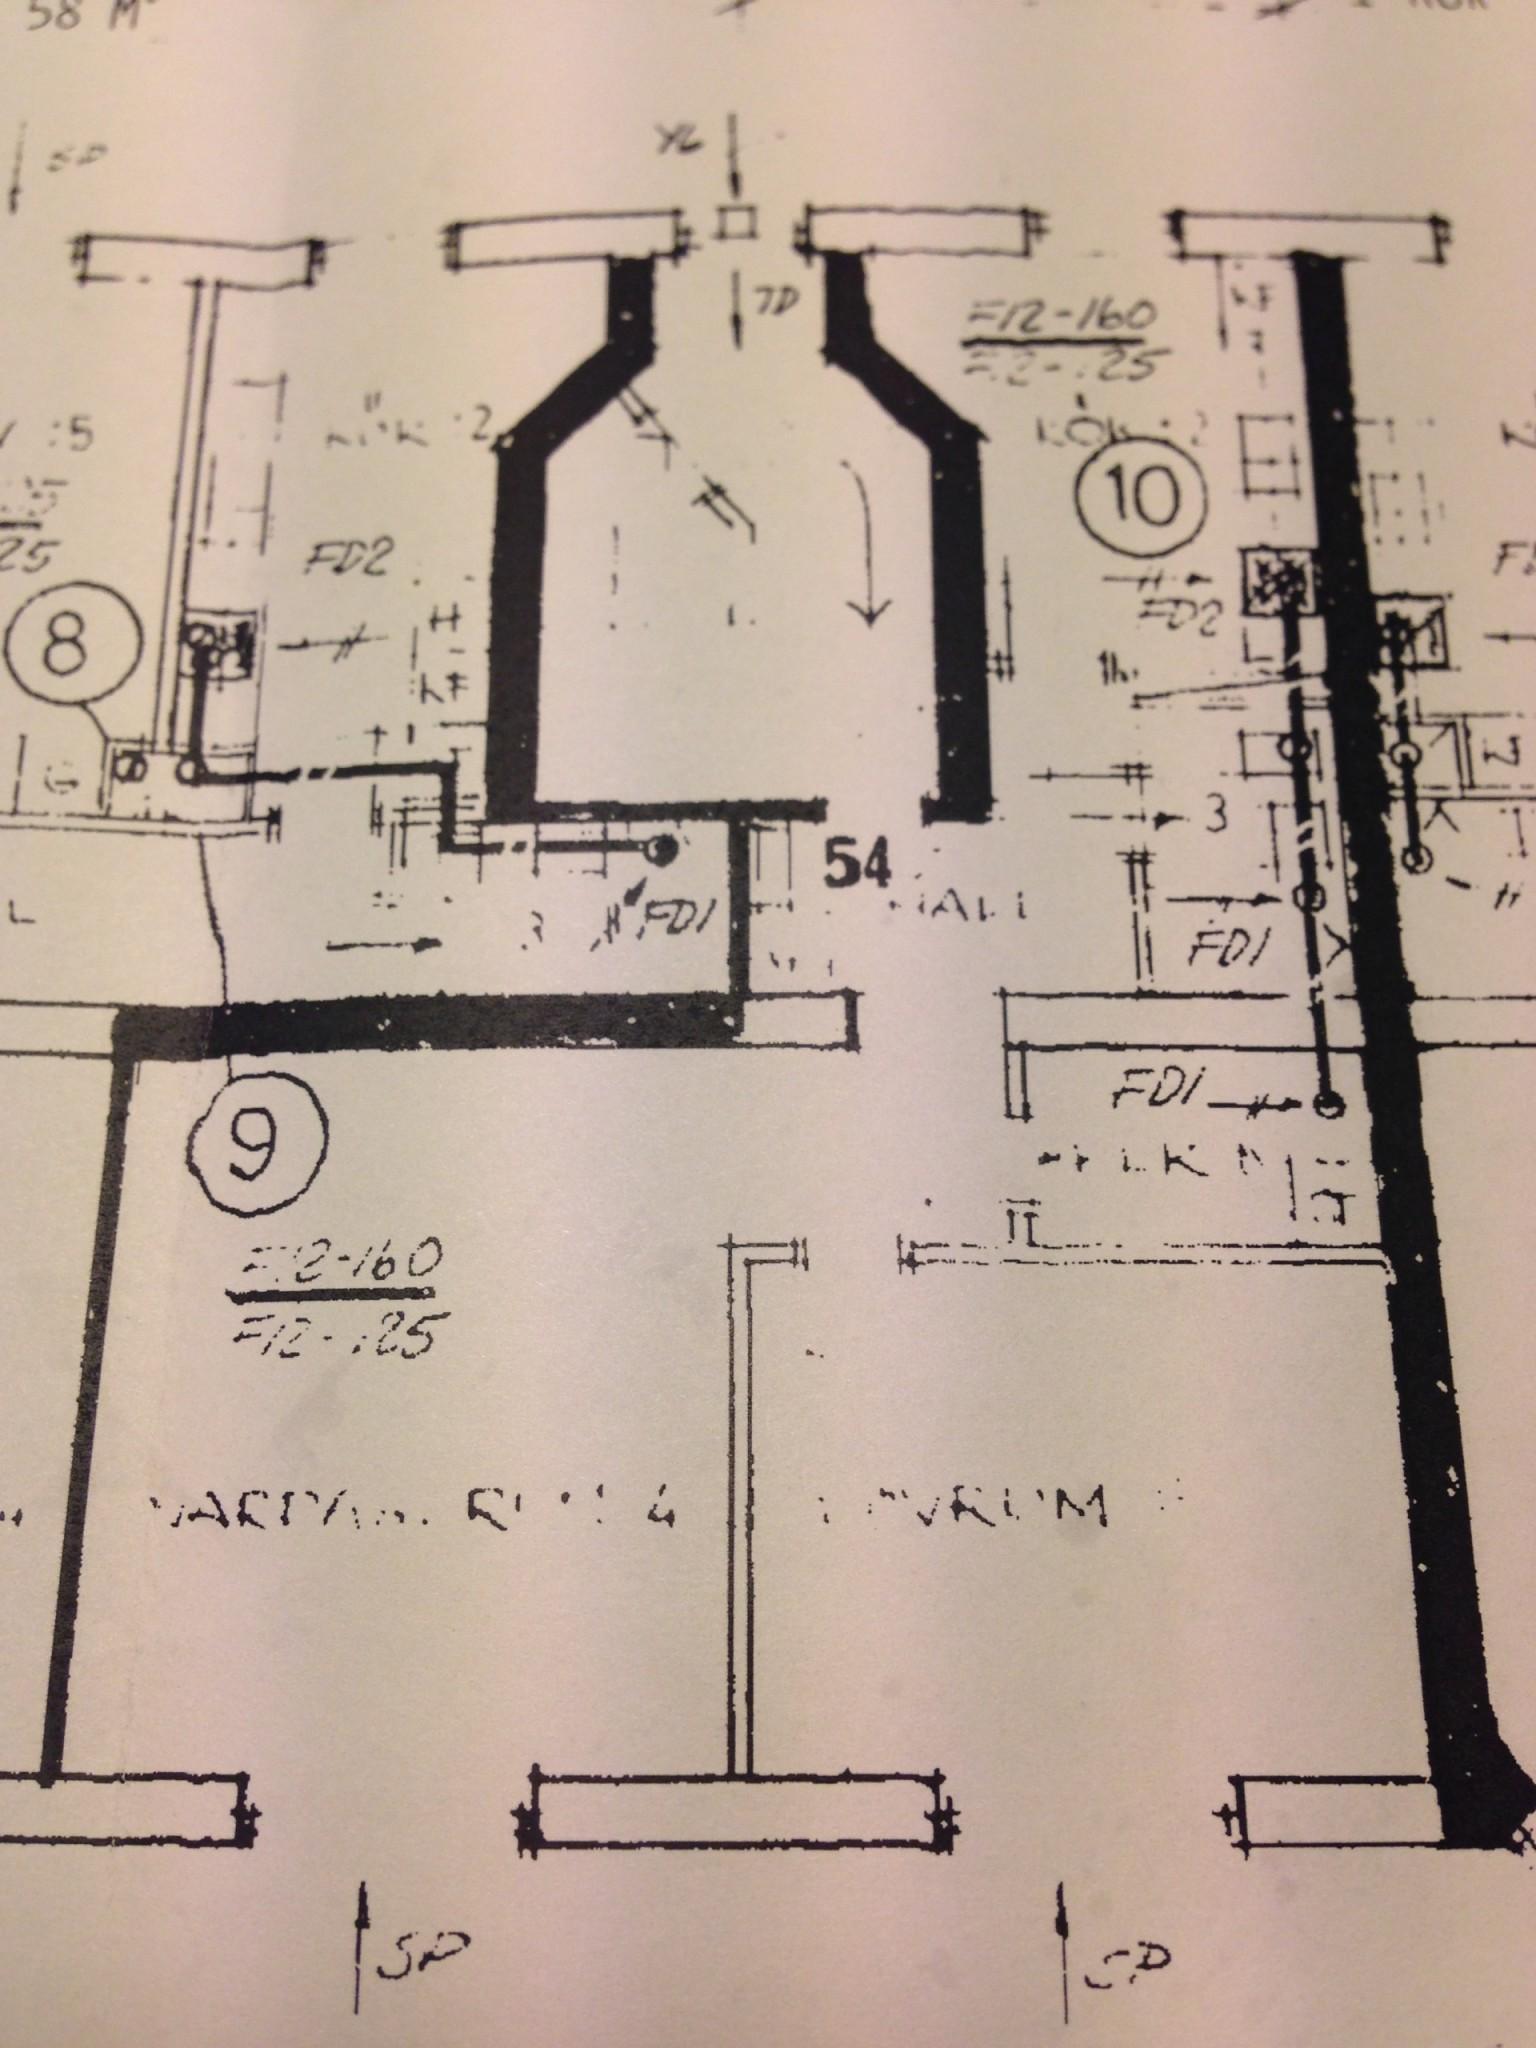 Renovering av en lägenhet (59kvm) i ett landshövdingehus